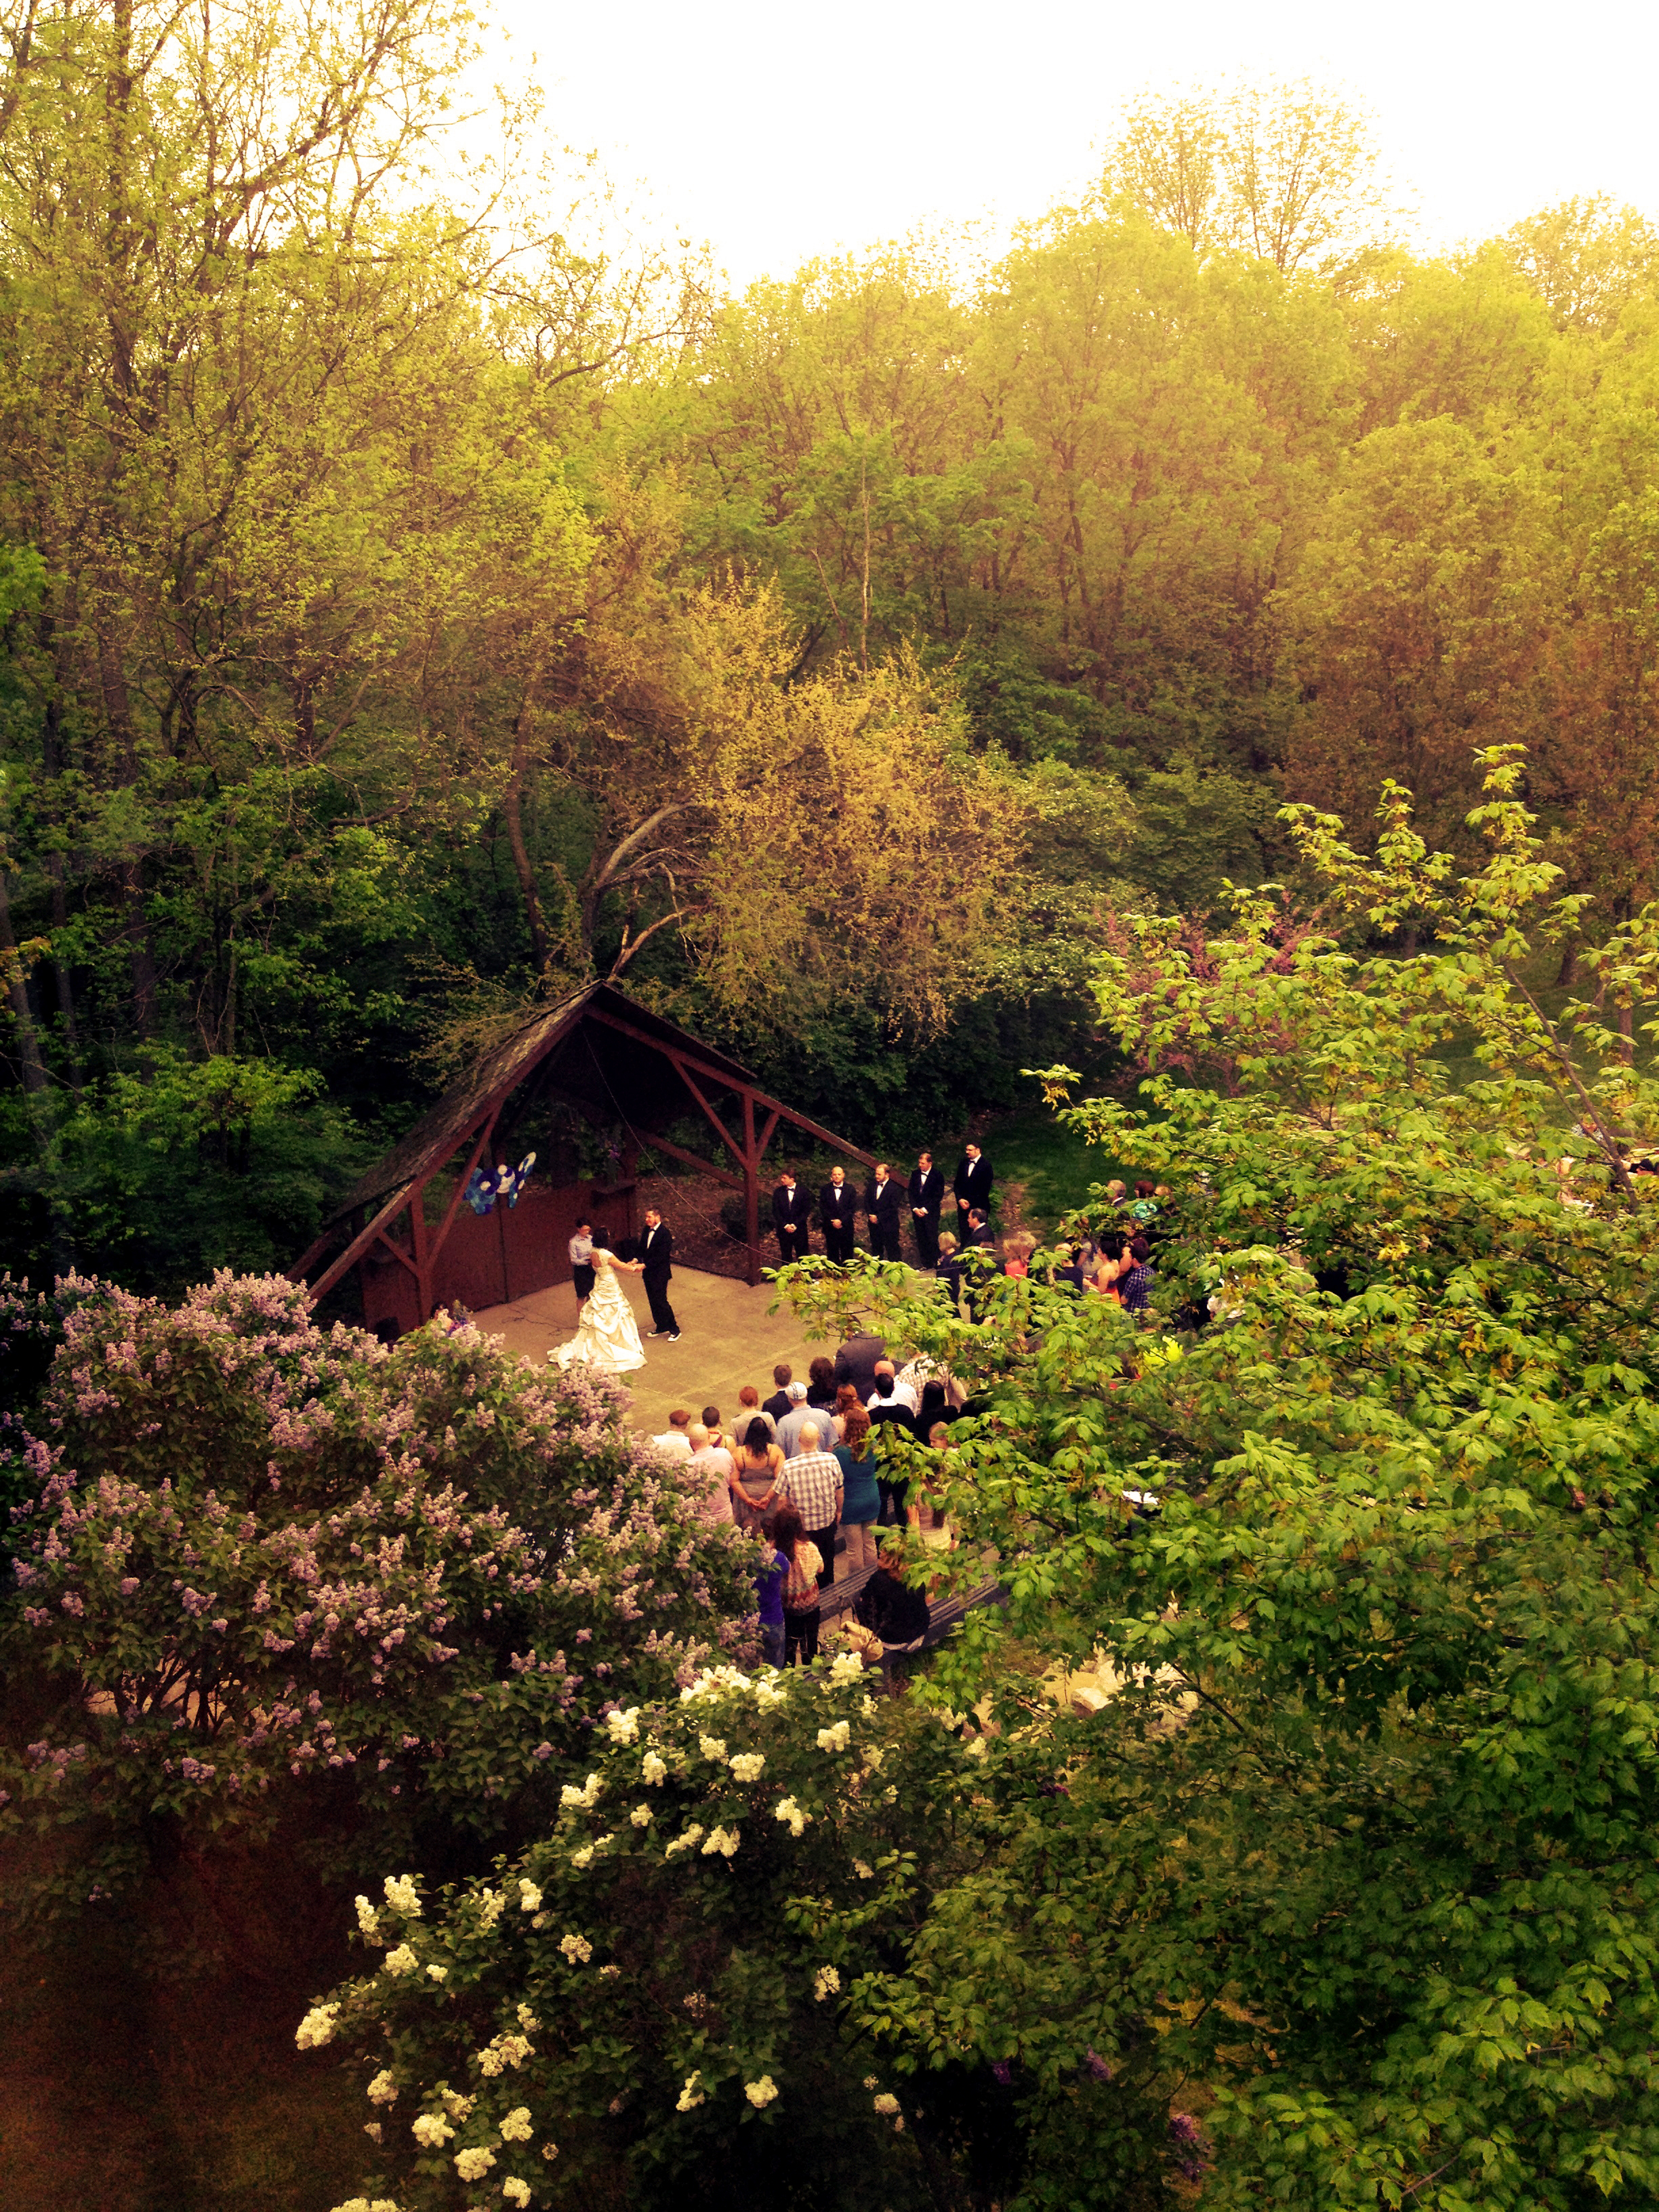 boonshoft-museum-dayton-wedding-reception-banquet-rental-elite-catering_005.jpg